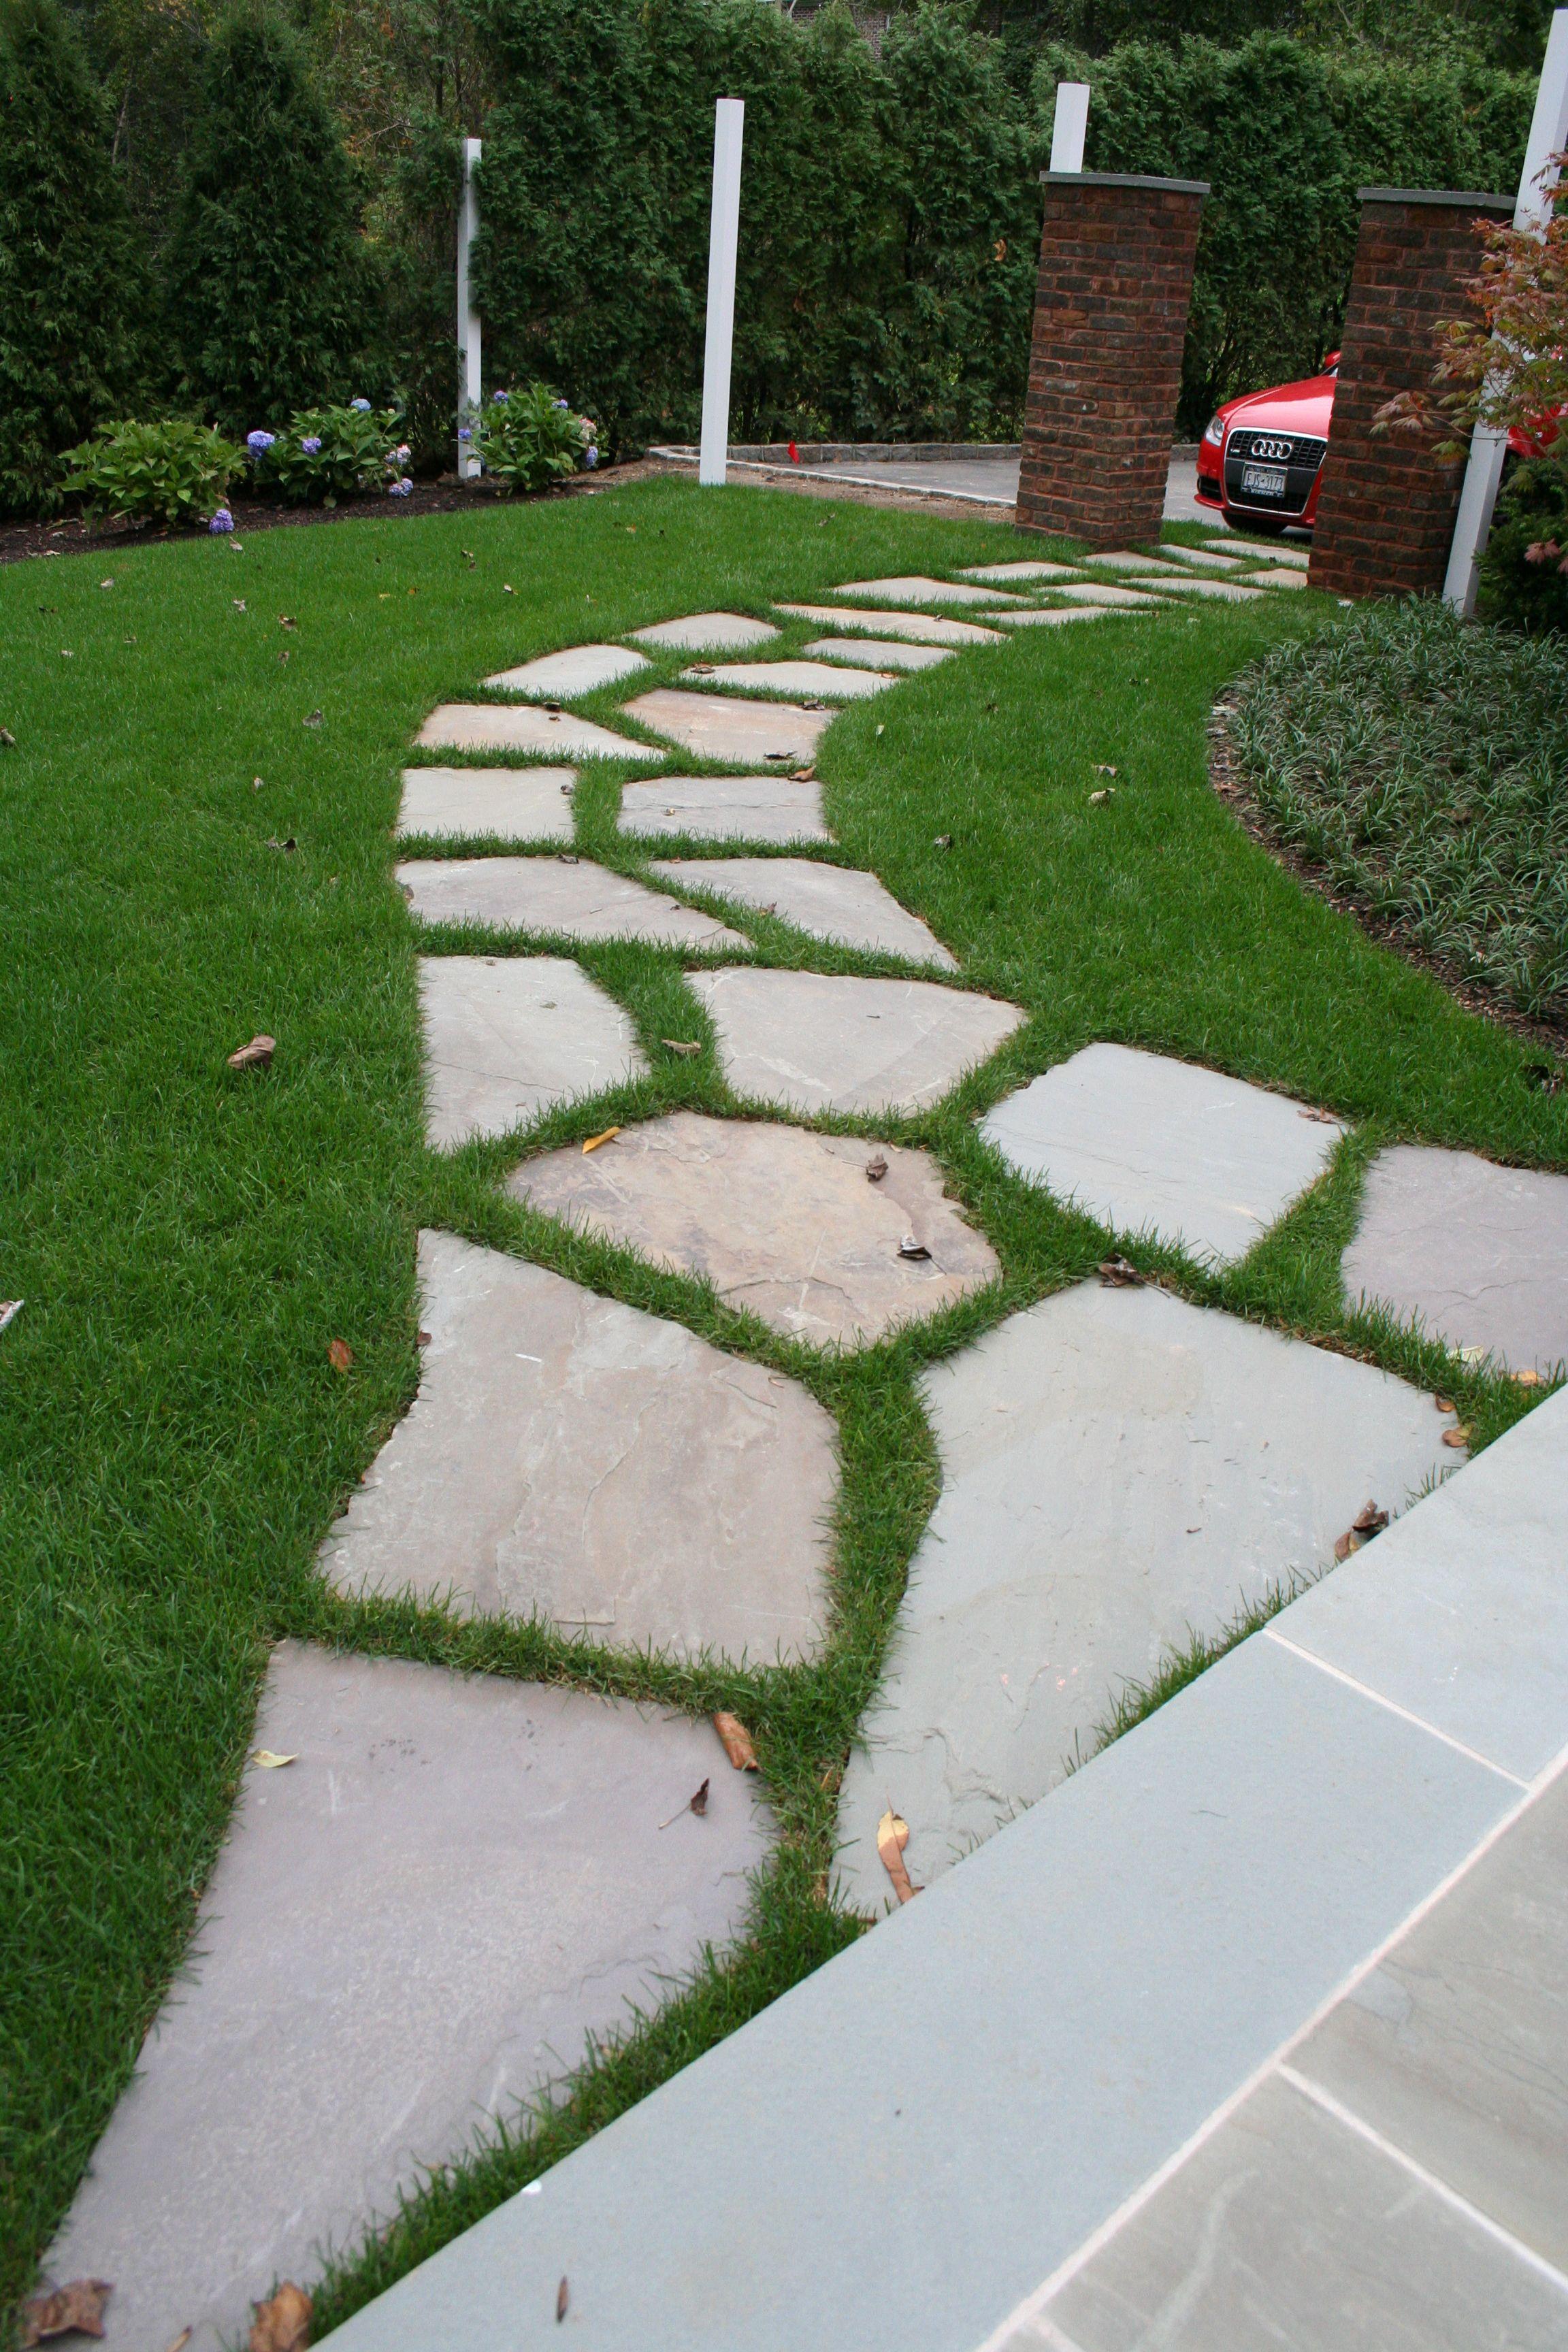 Irregular Bluestone Path Set In Lawn Irregularbluestone Bluestonepath Mainstreetnursery Garden Stepping Stones Garden Paths Walkway Design